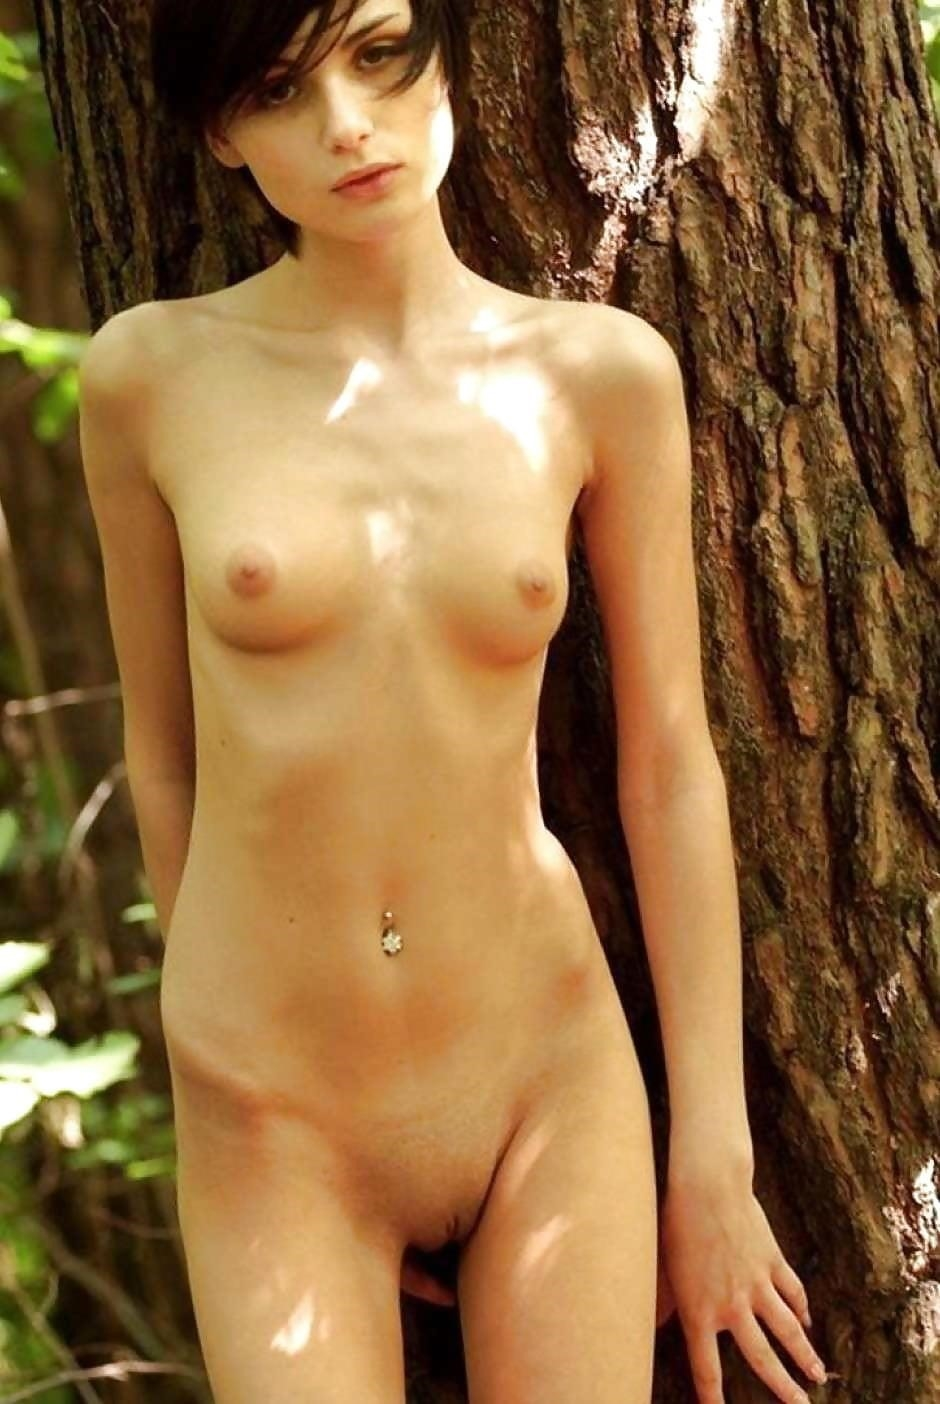 Hot skinny girls nude-9281